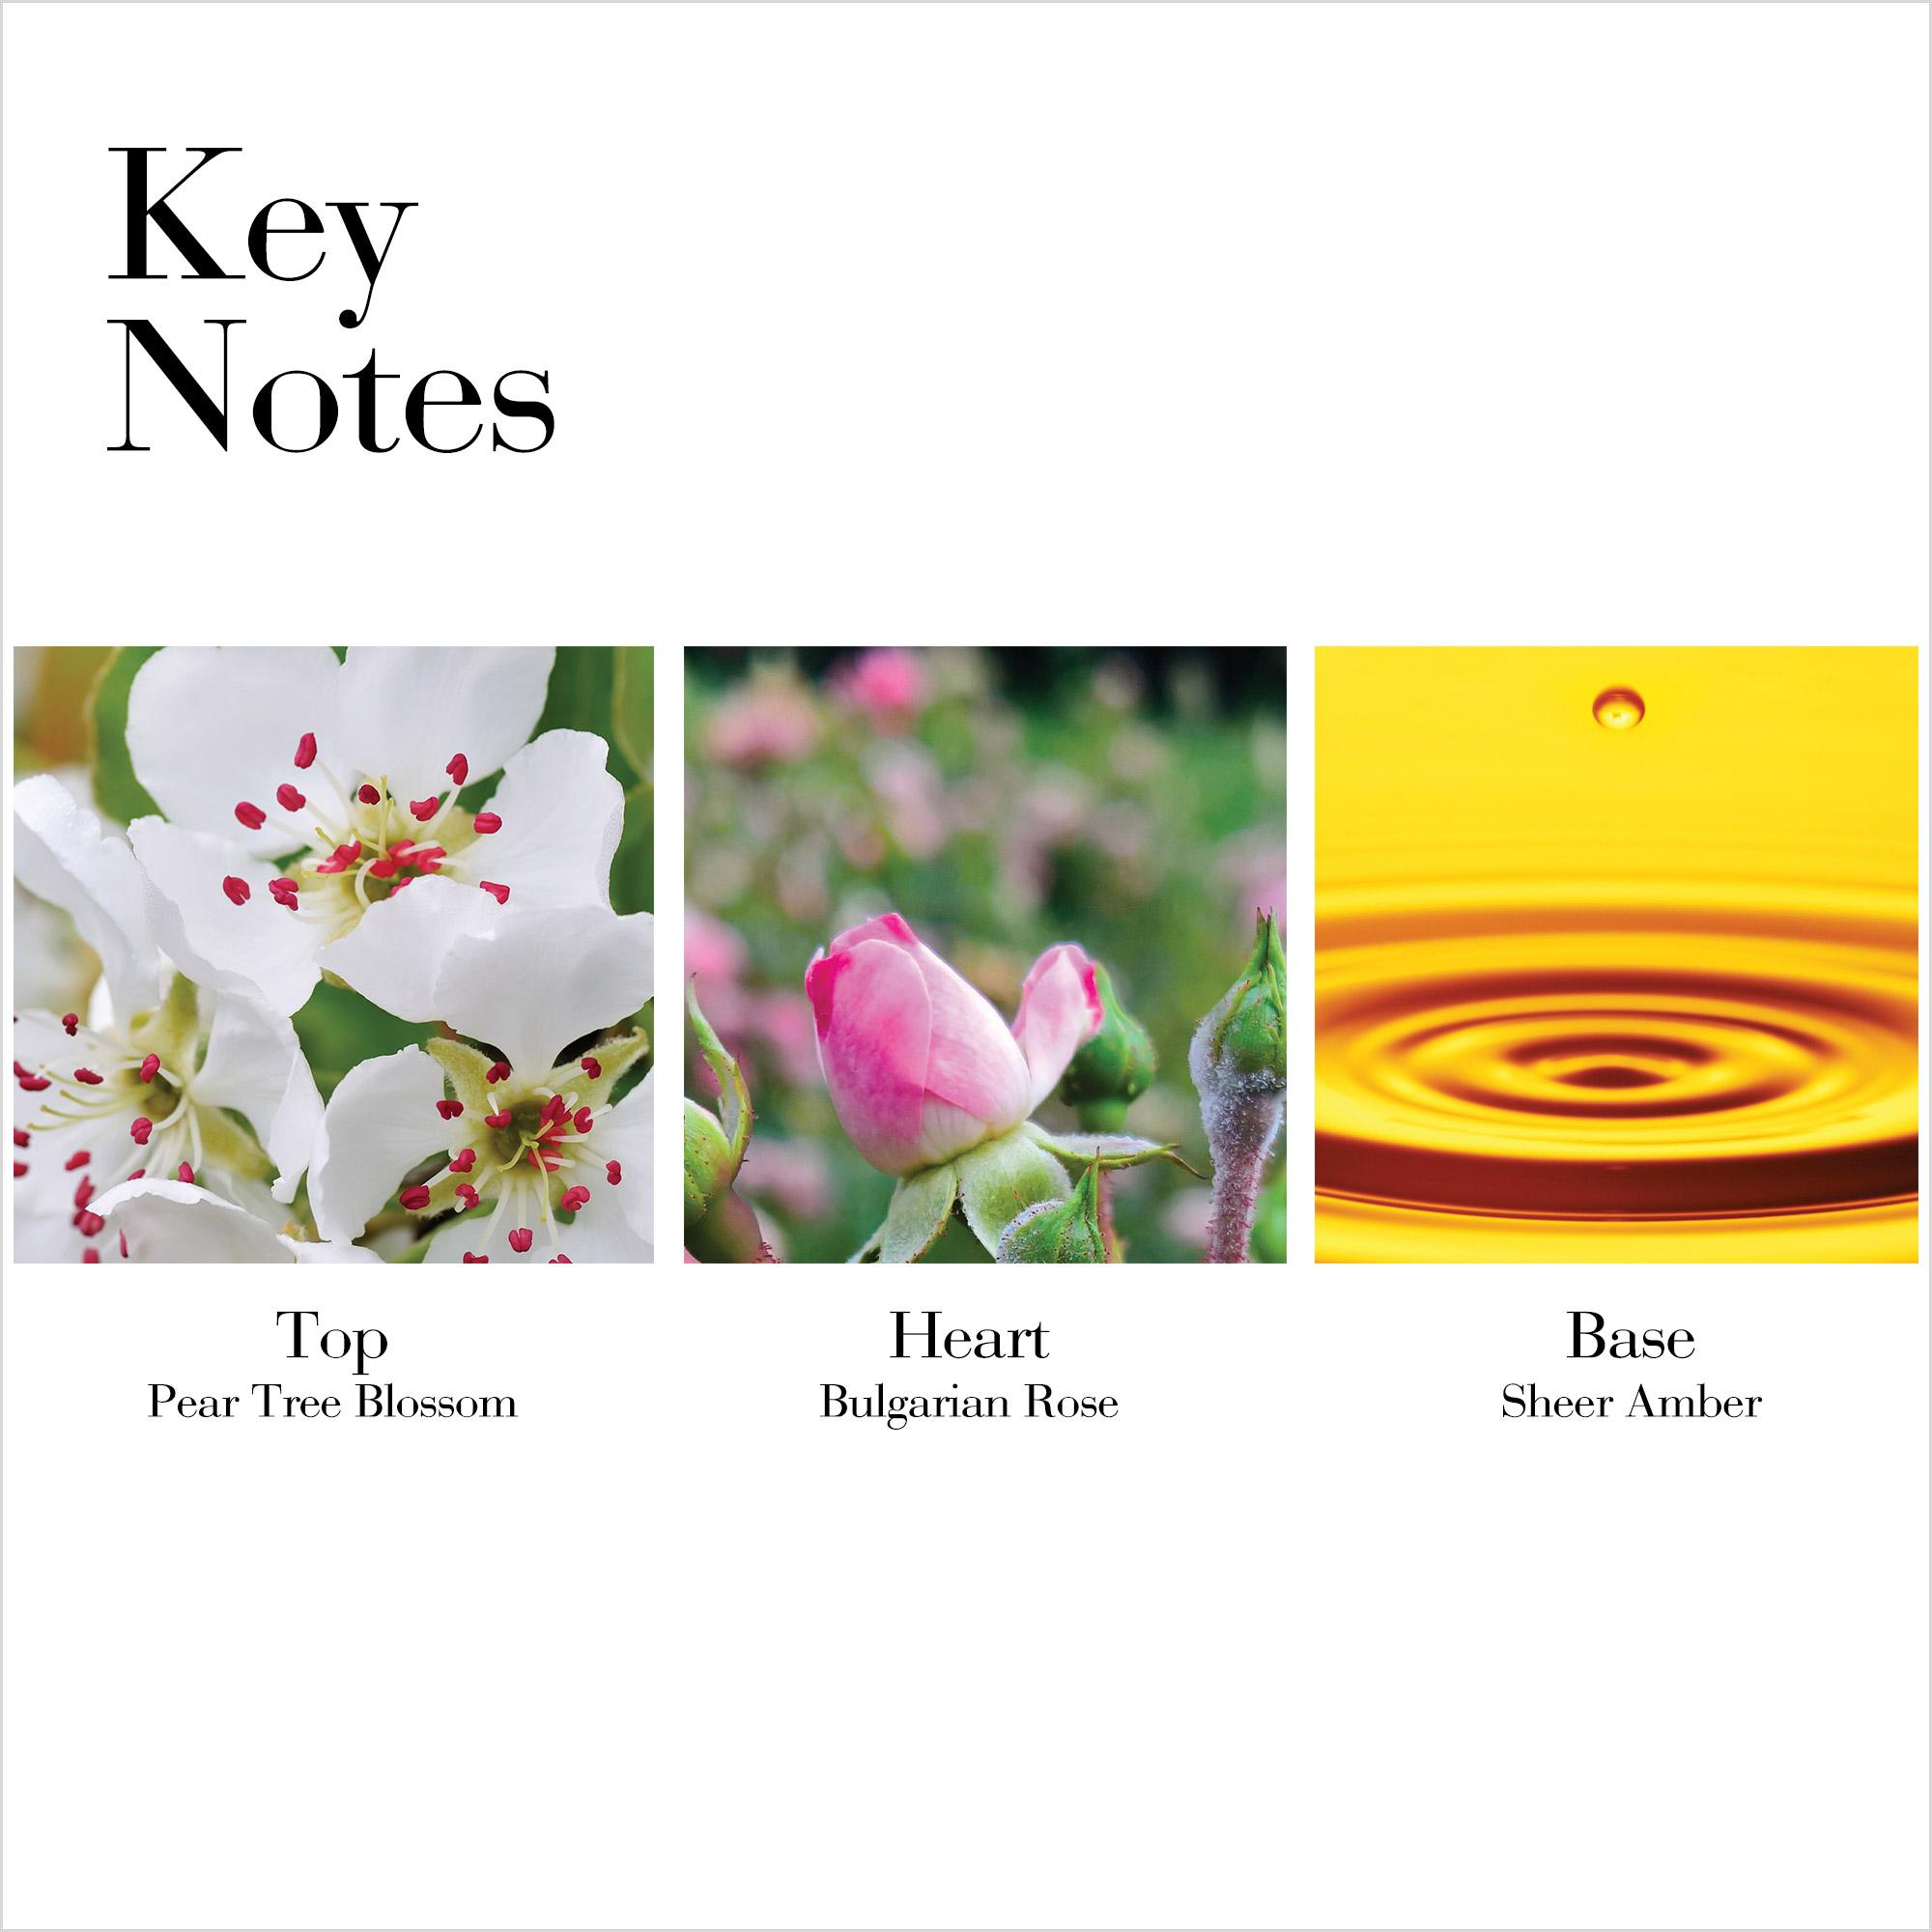 Key Notes- Top Pear Tree Blossom, Heart Bulgarian Rose, Base Sheer Amber